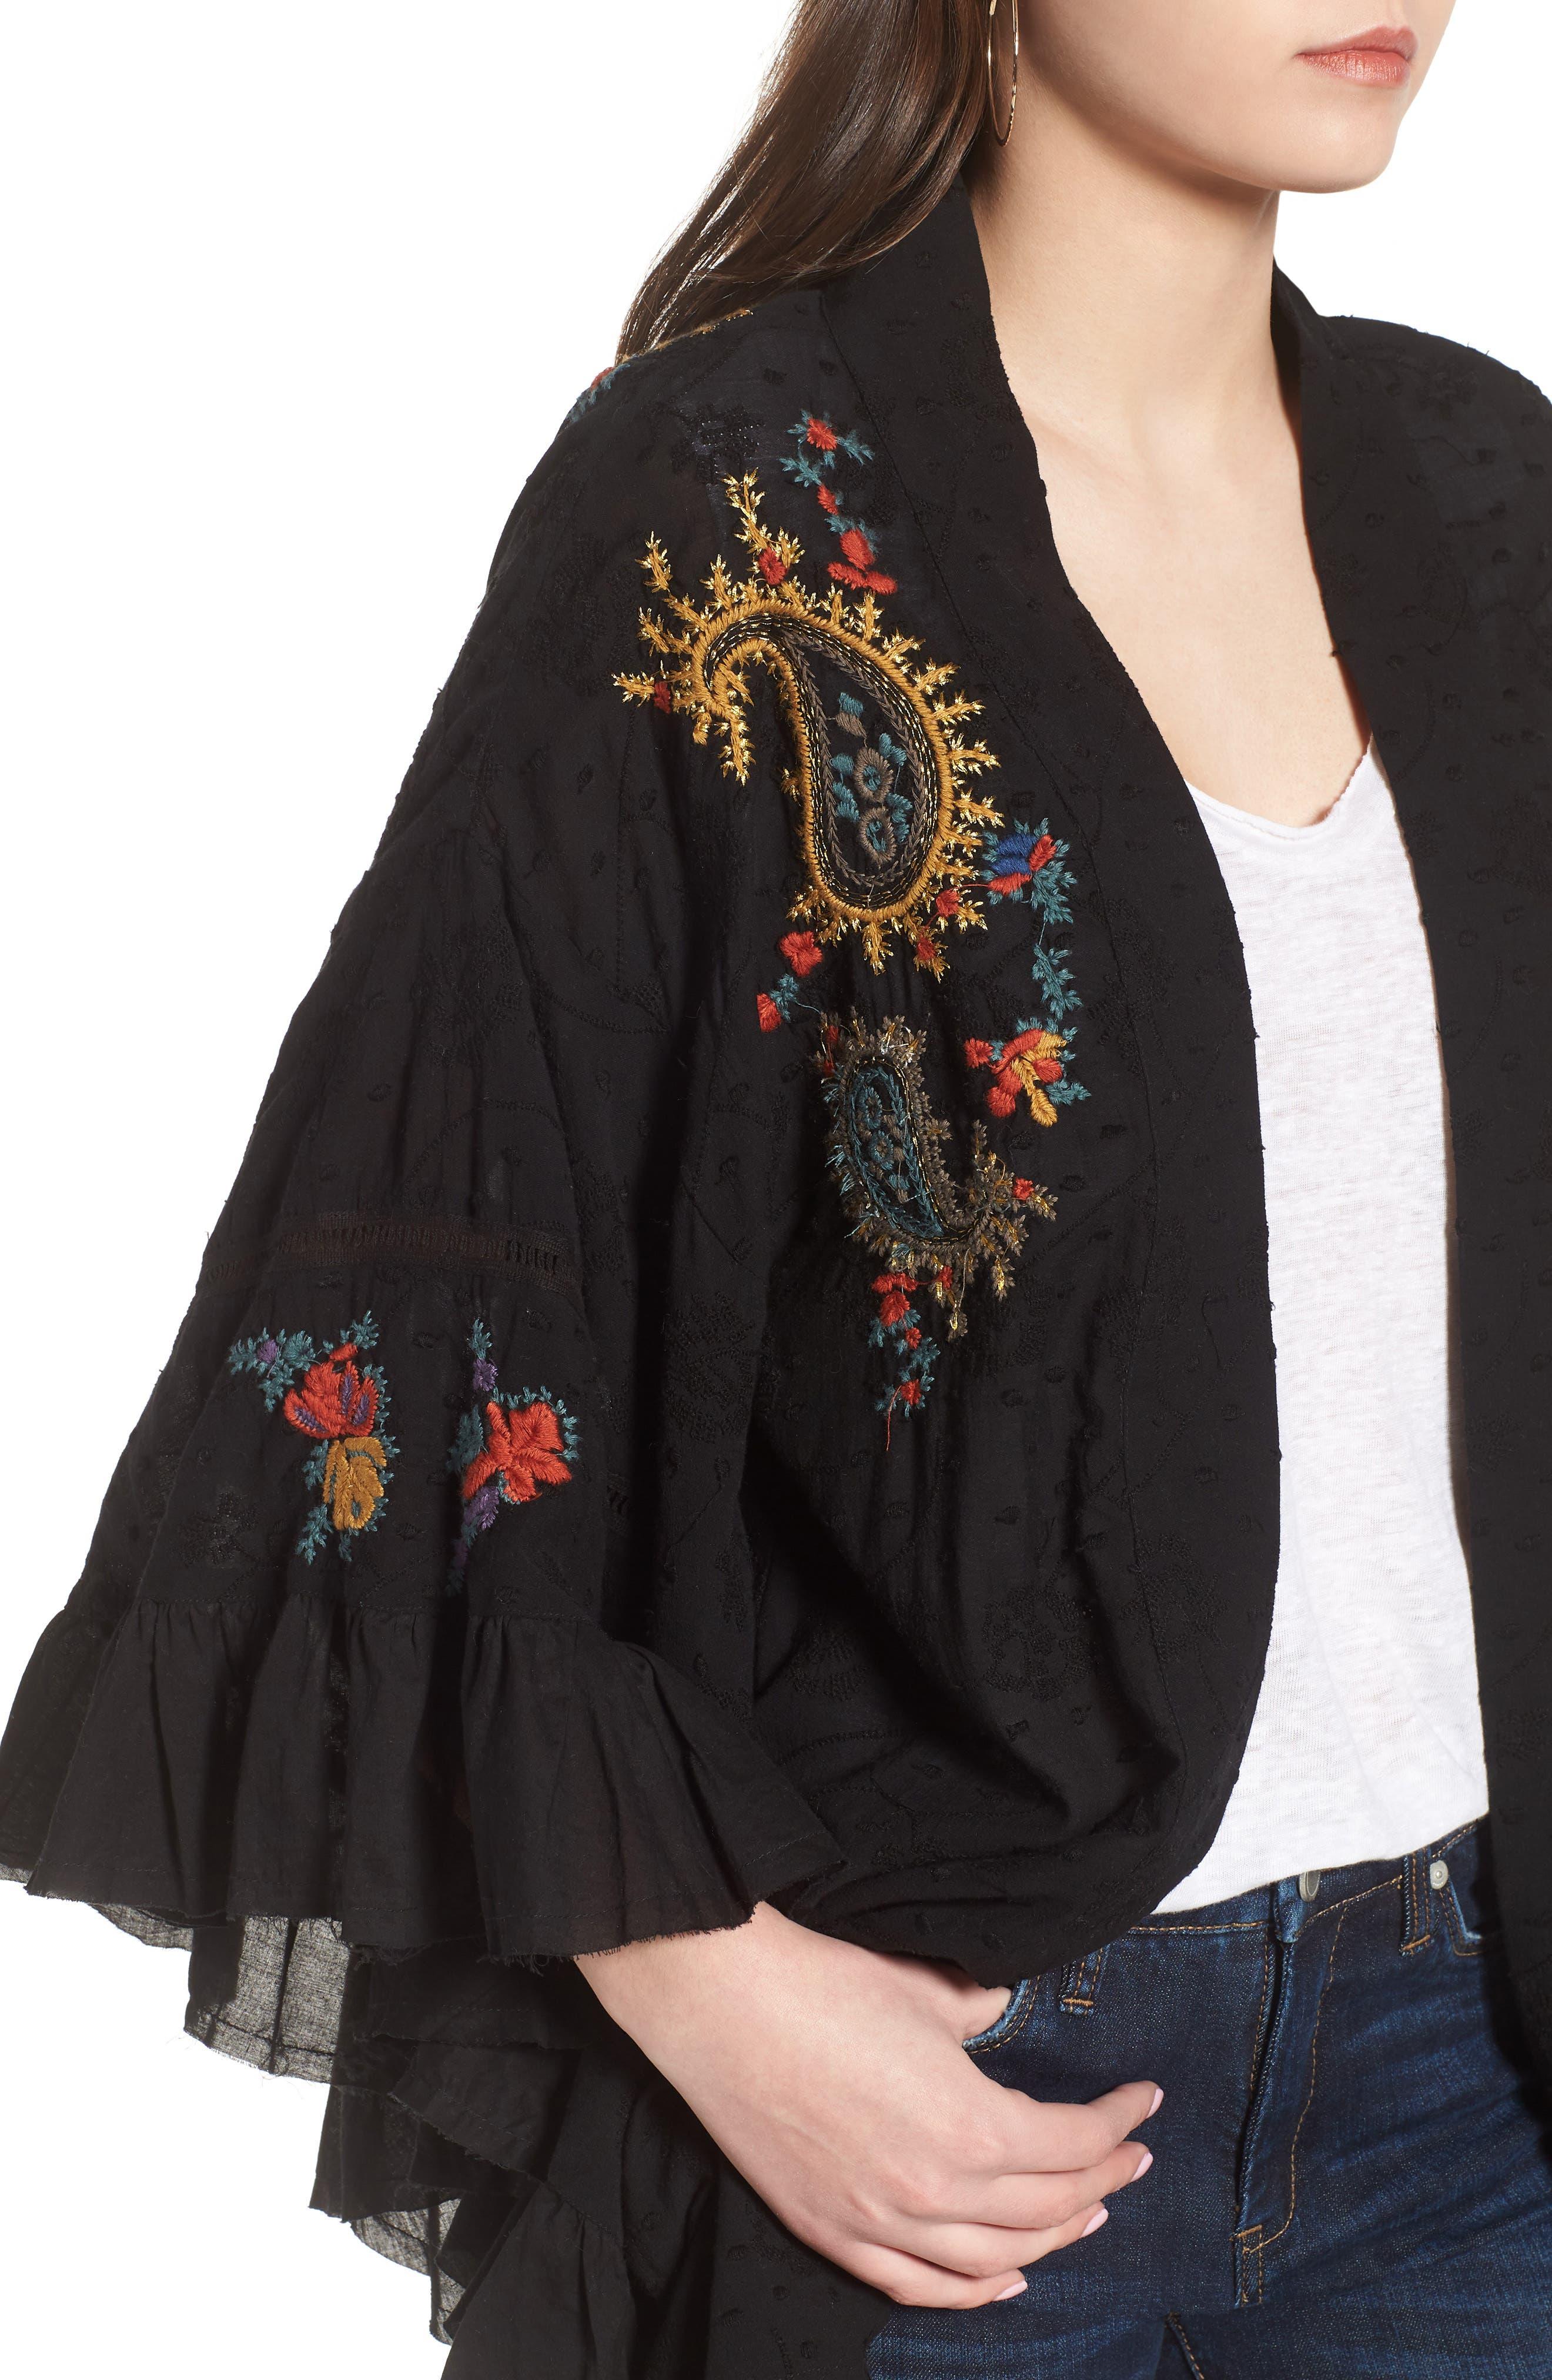 Dottie West Kimono,                             Alternate thumbnail 4, color,                             BLACK